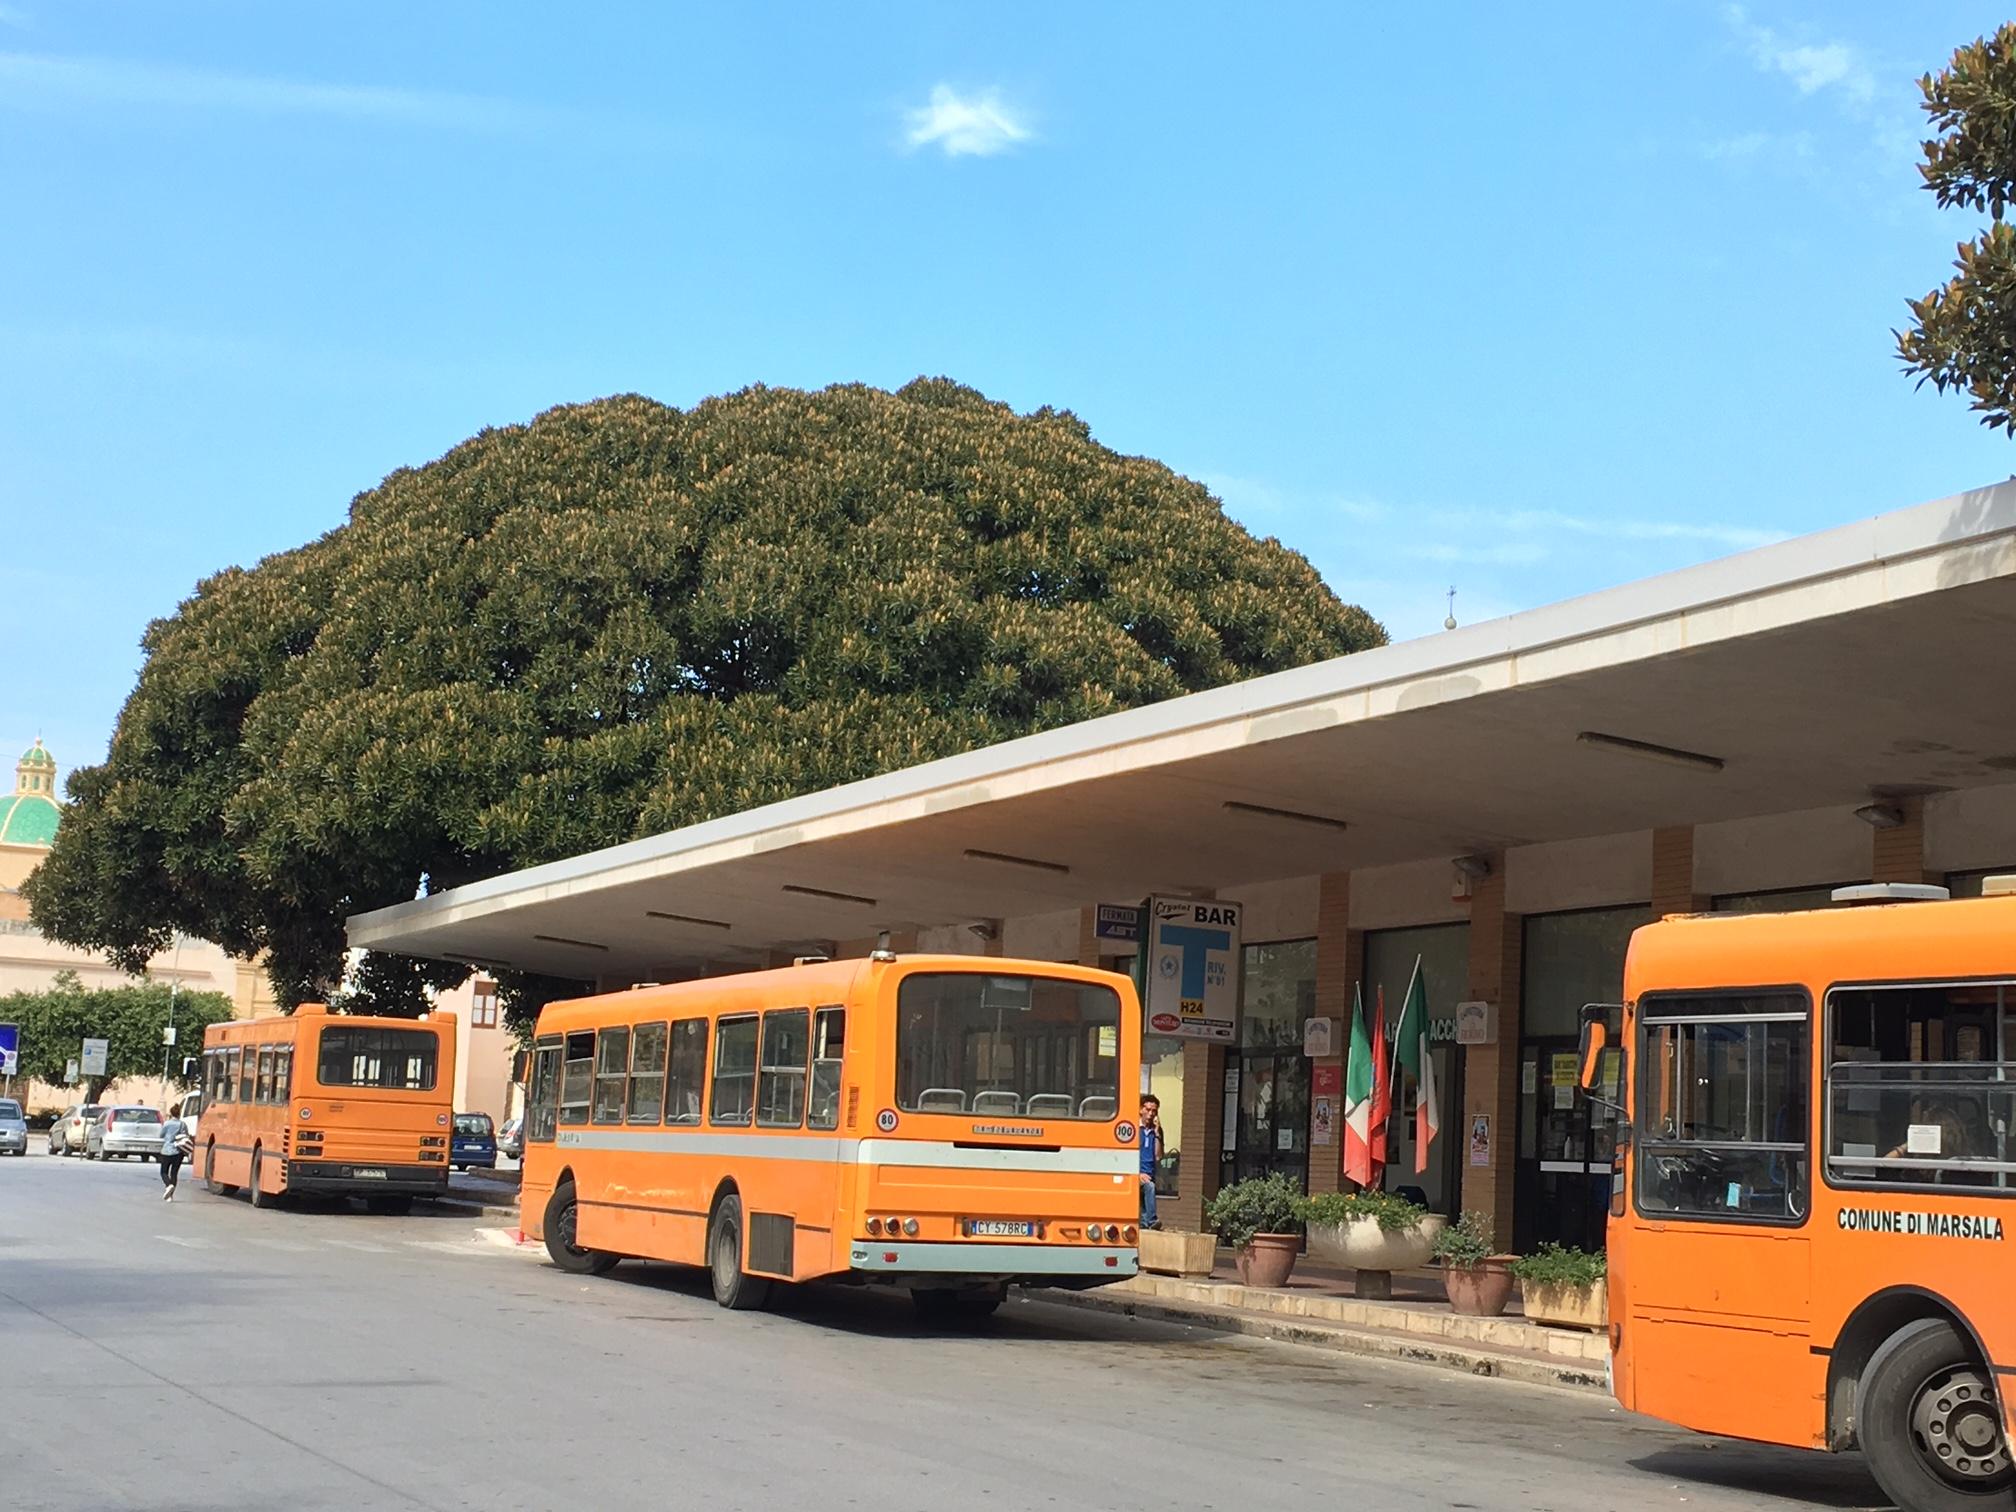 autostazione bus